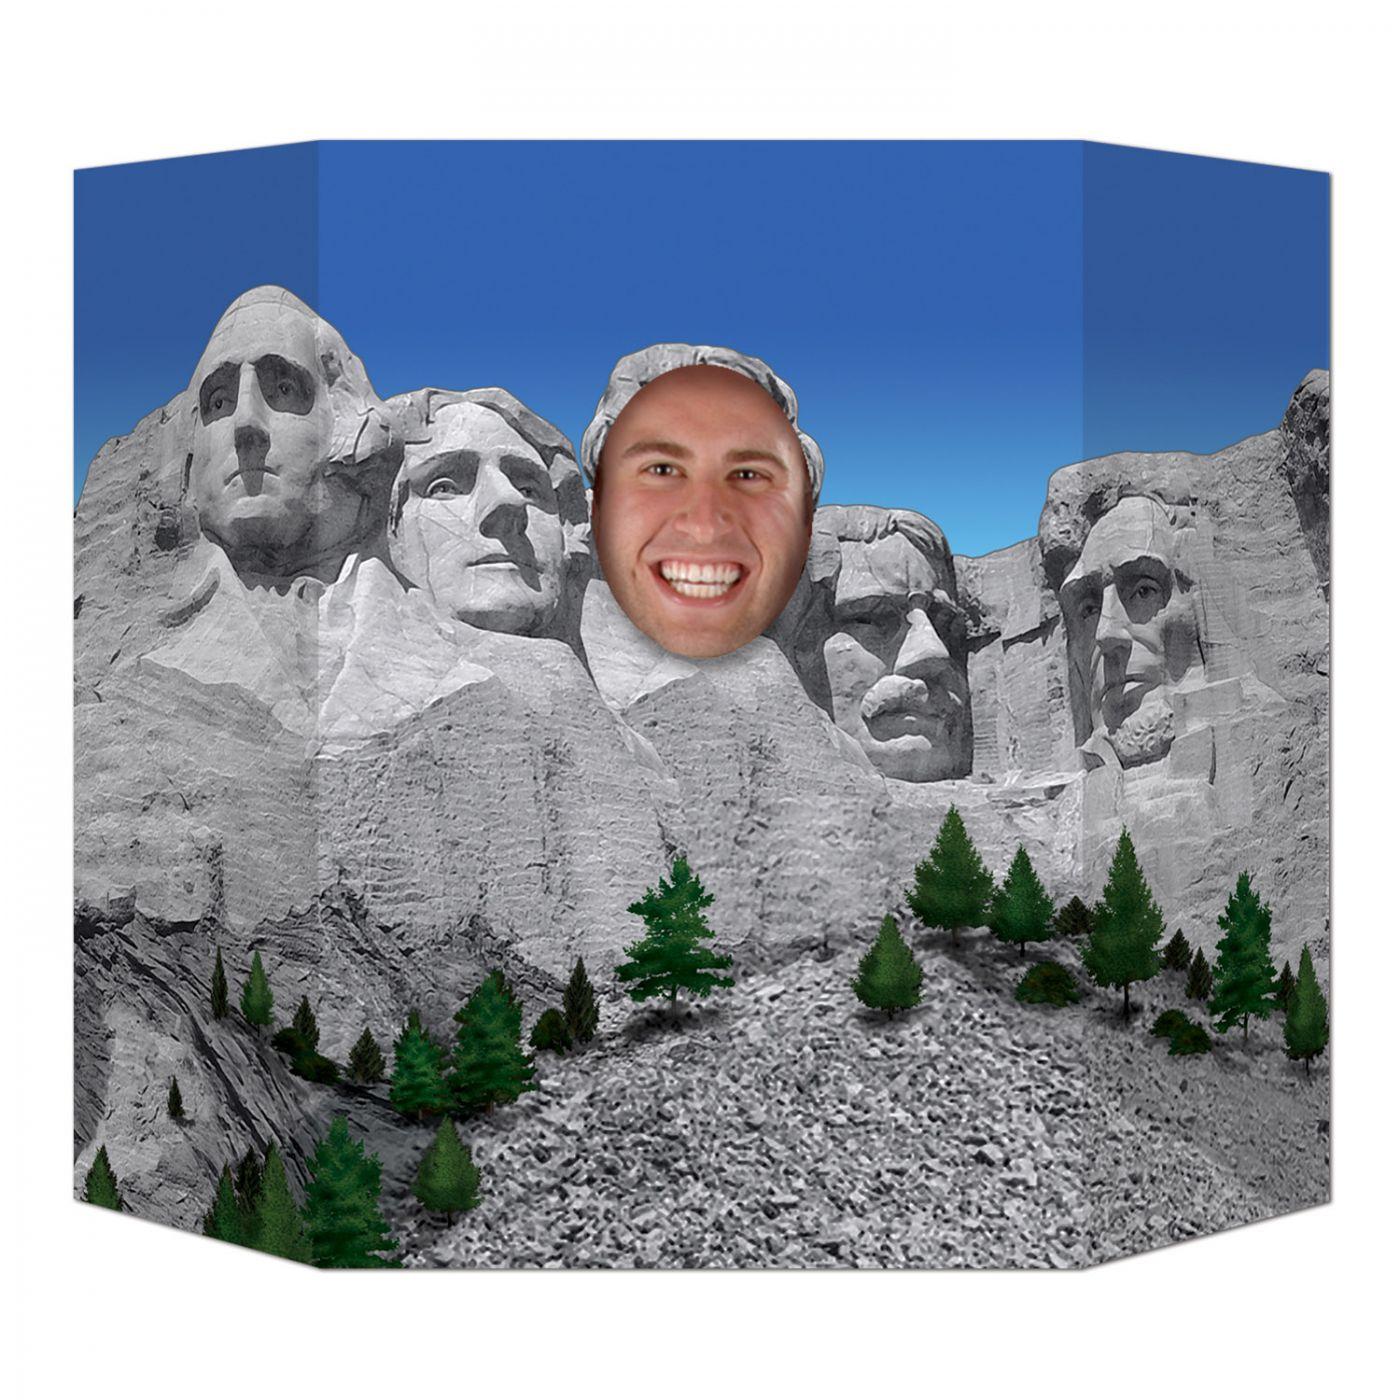 Presidential Mountain Photo Prop (6) image